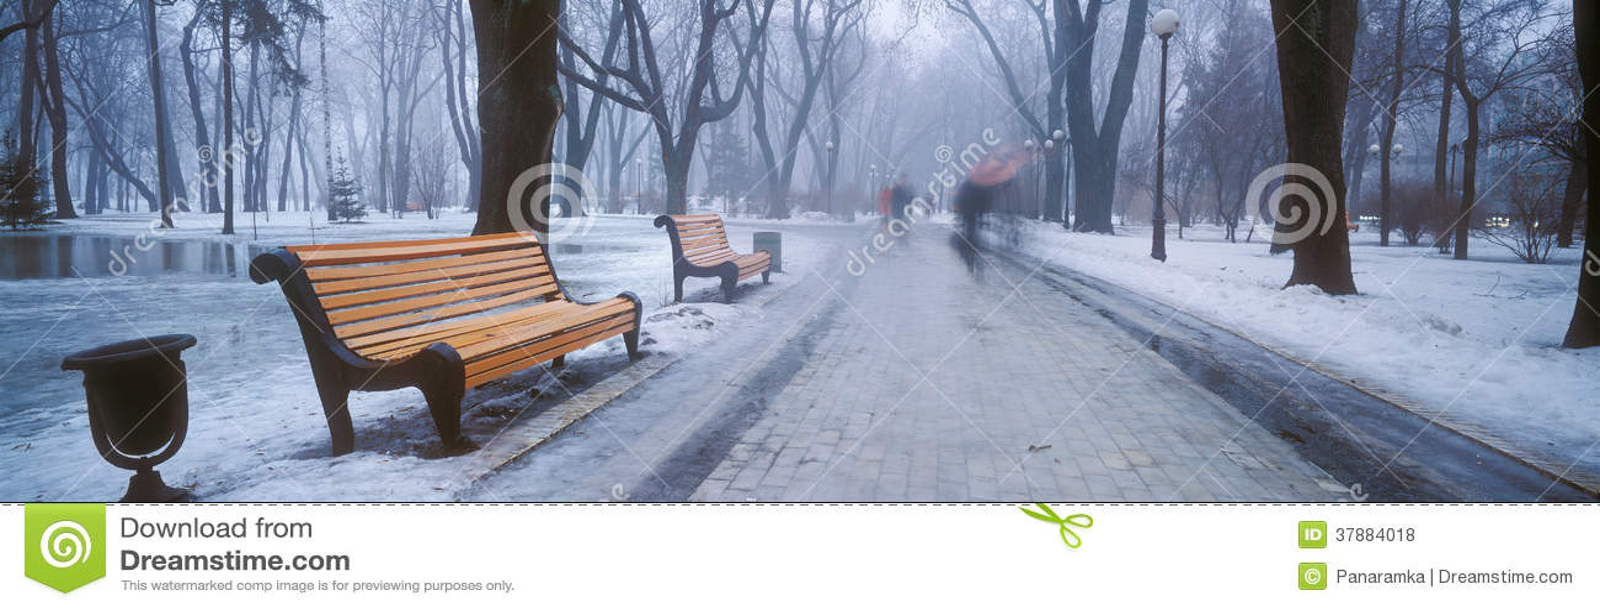 Mariiinskypark